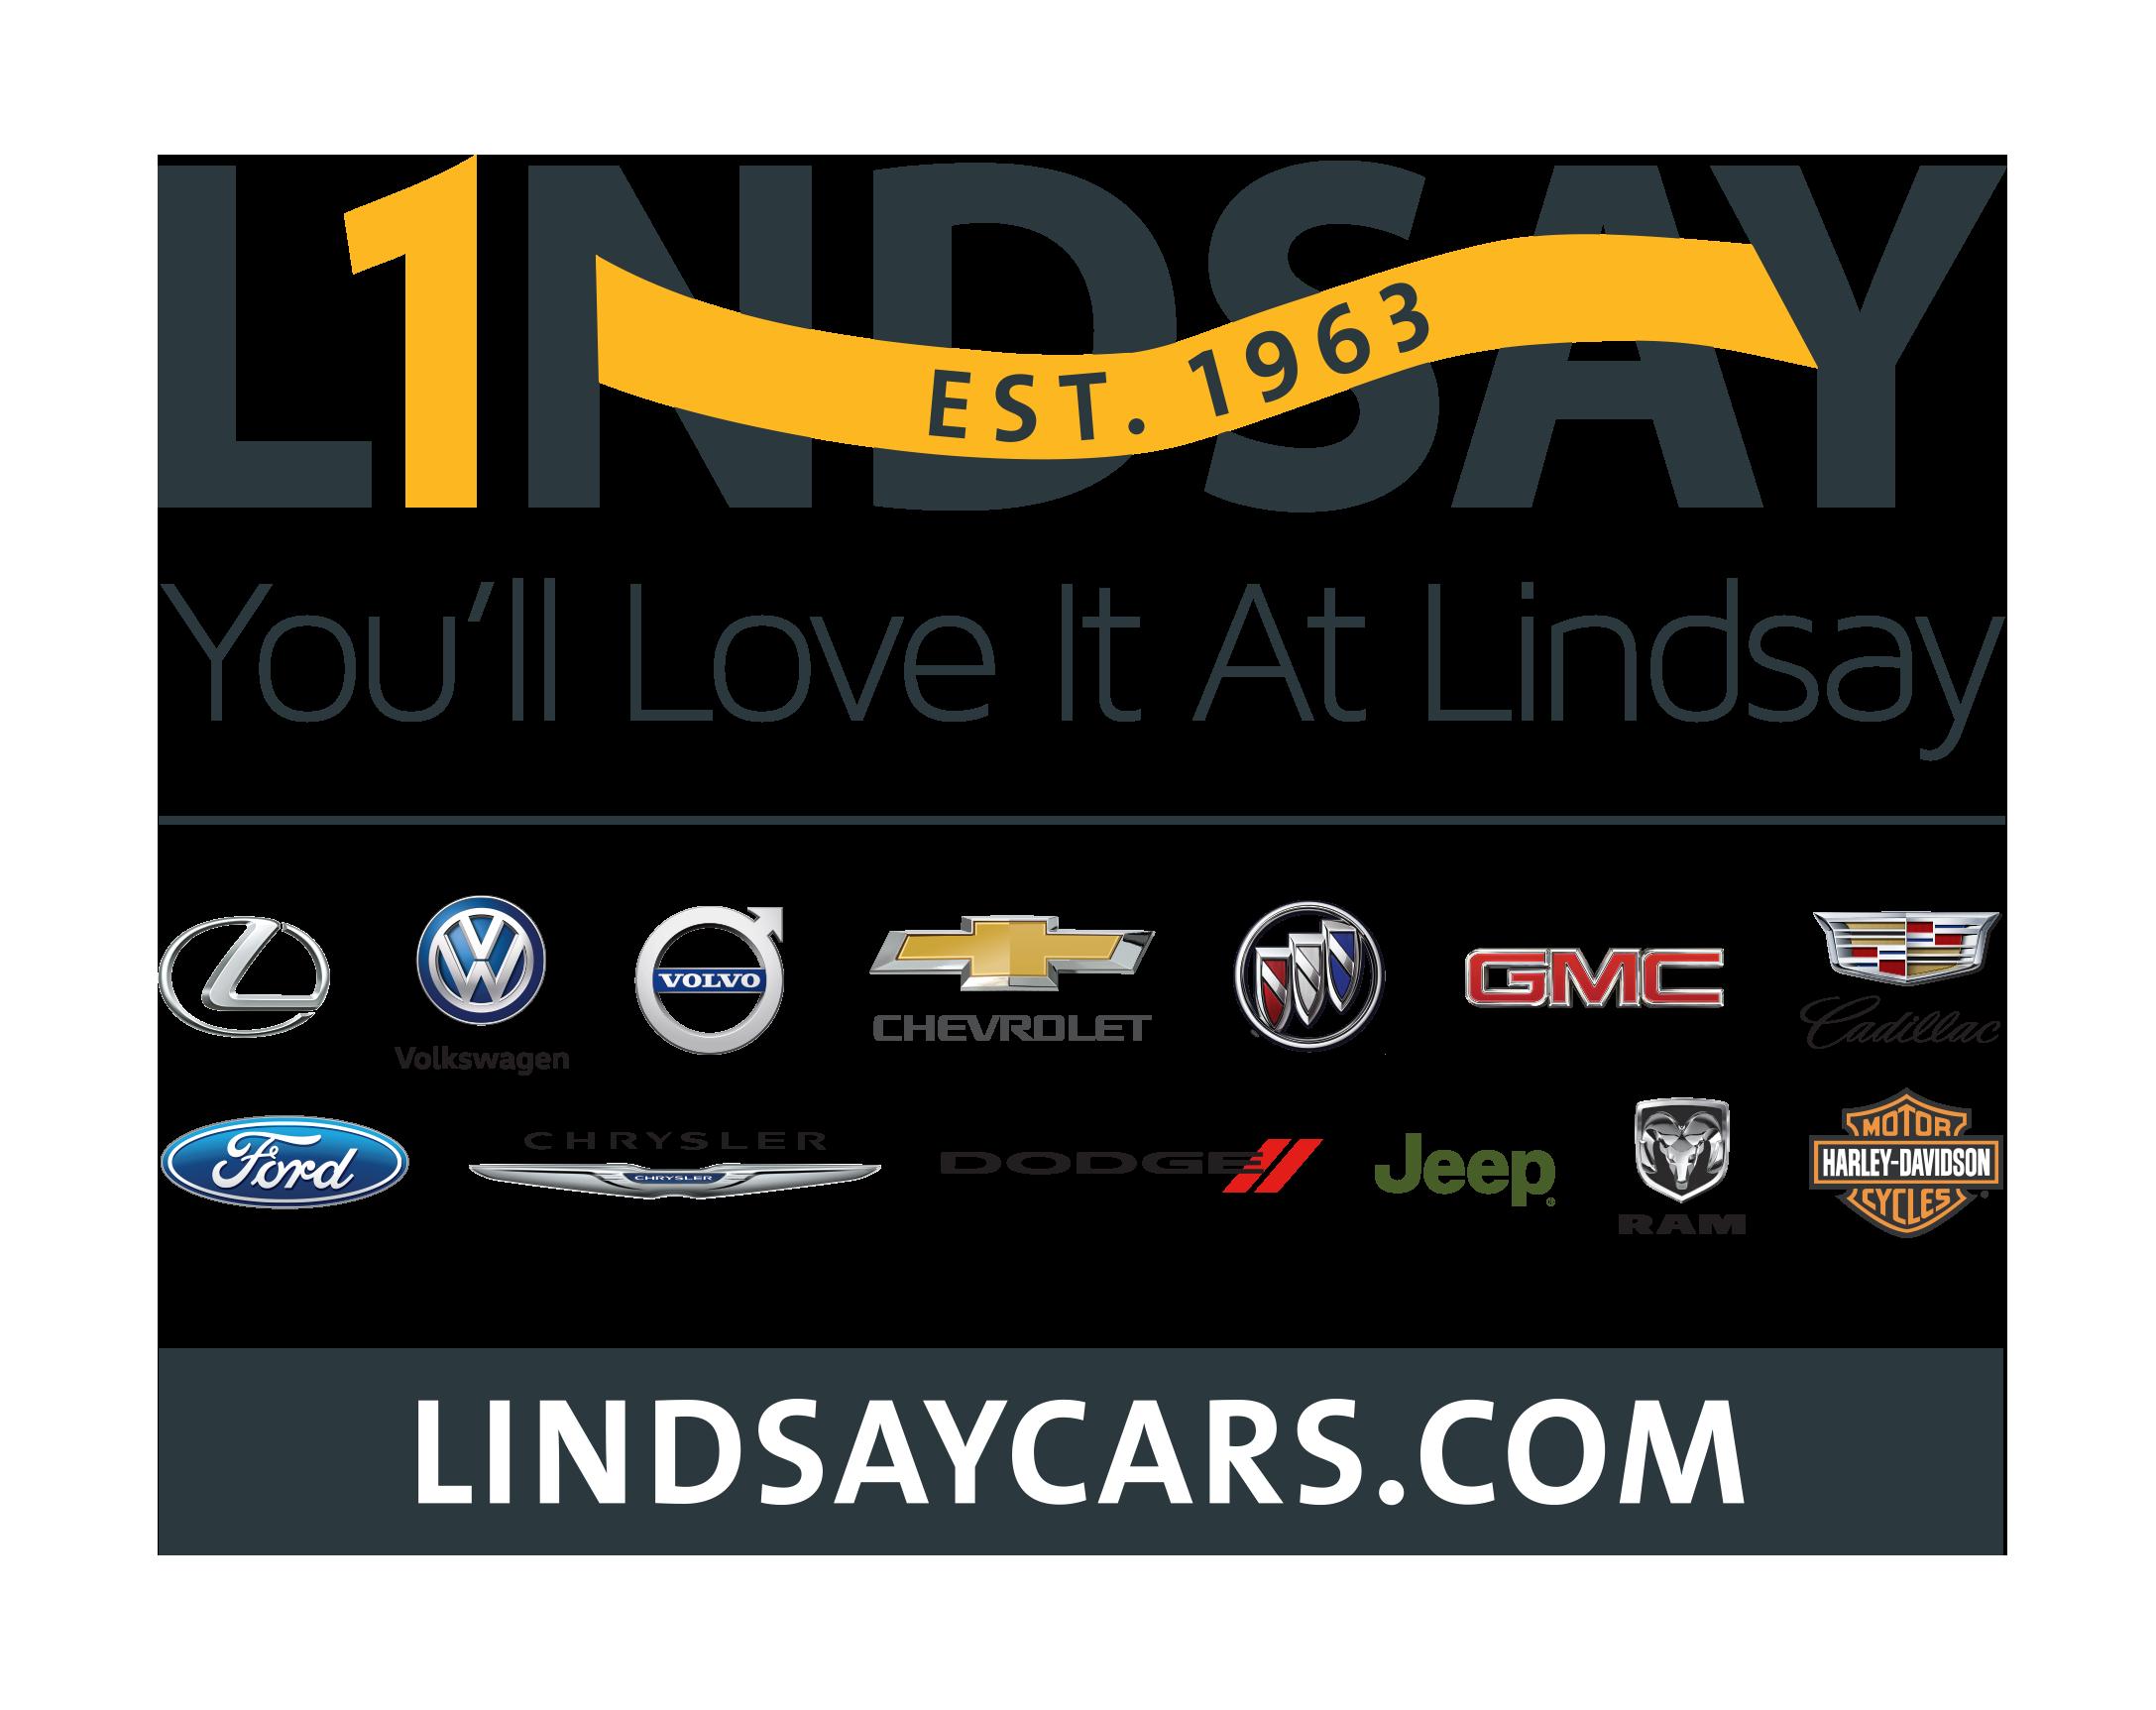 Lindsay Automotive